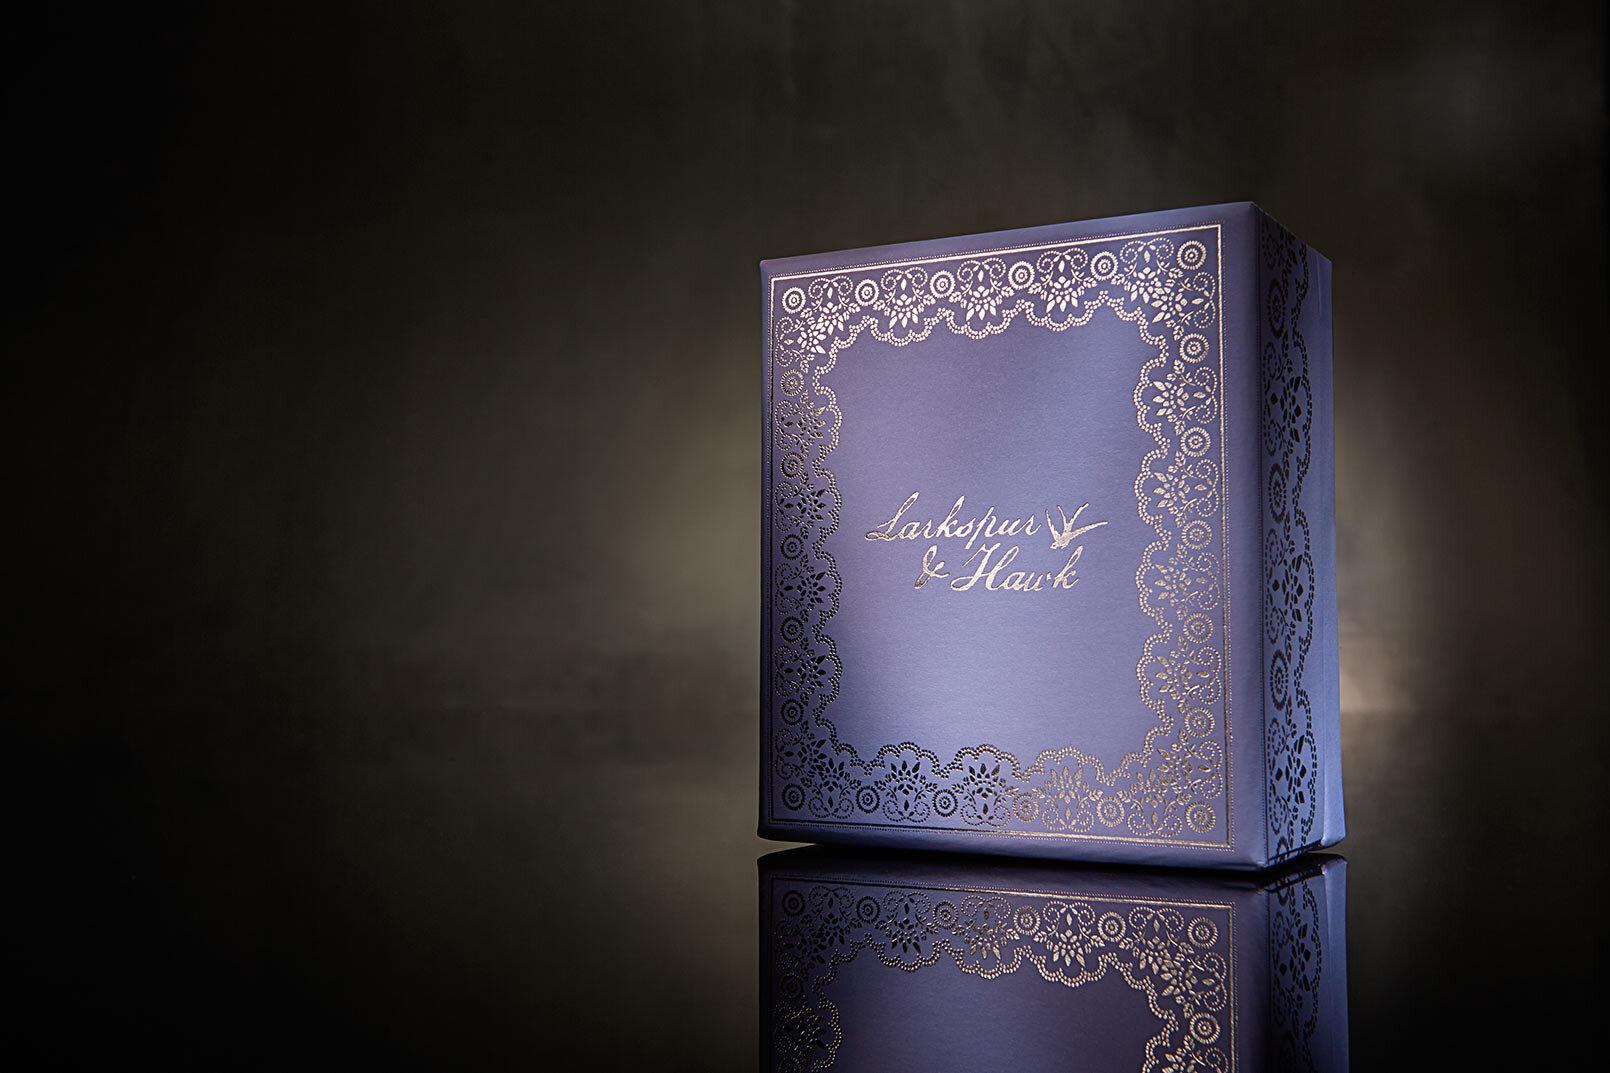 Larkspur-hawk-box-design-packaging-company-1.jpg